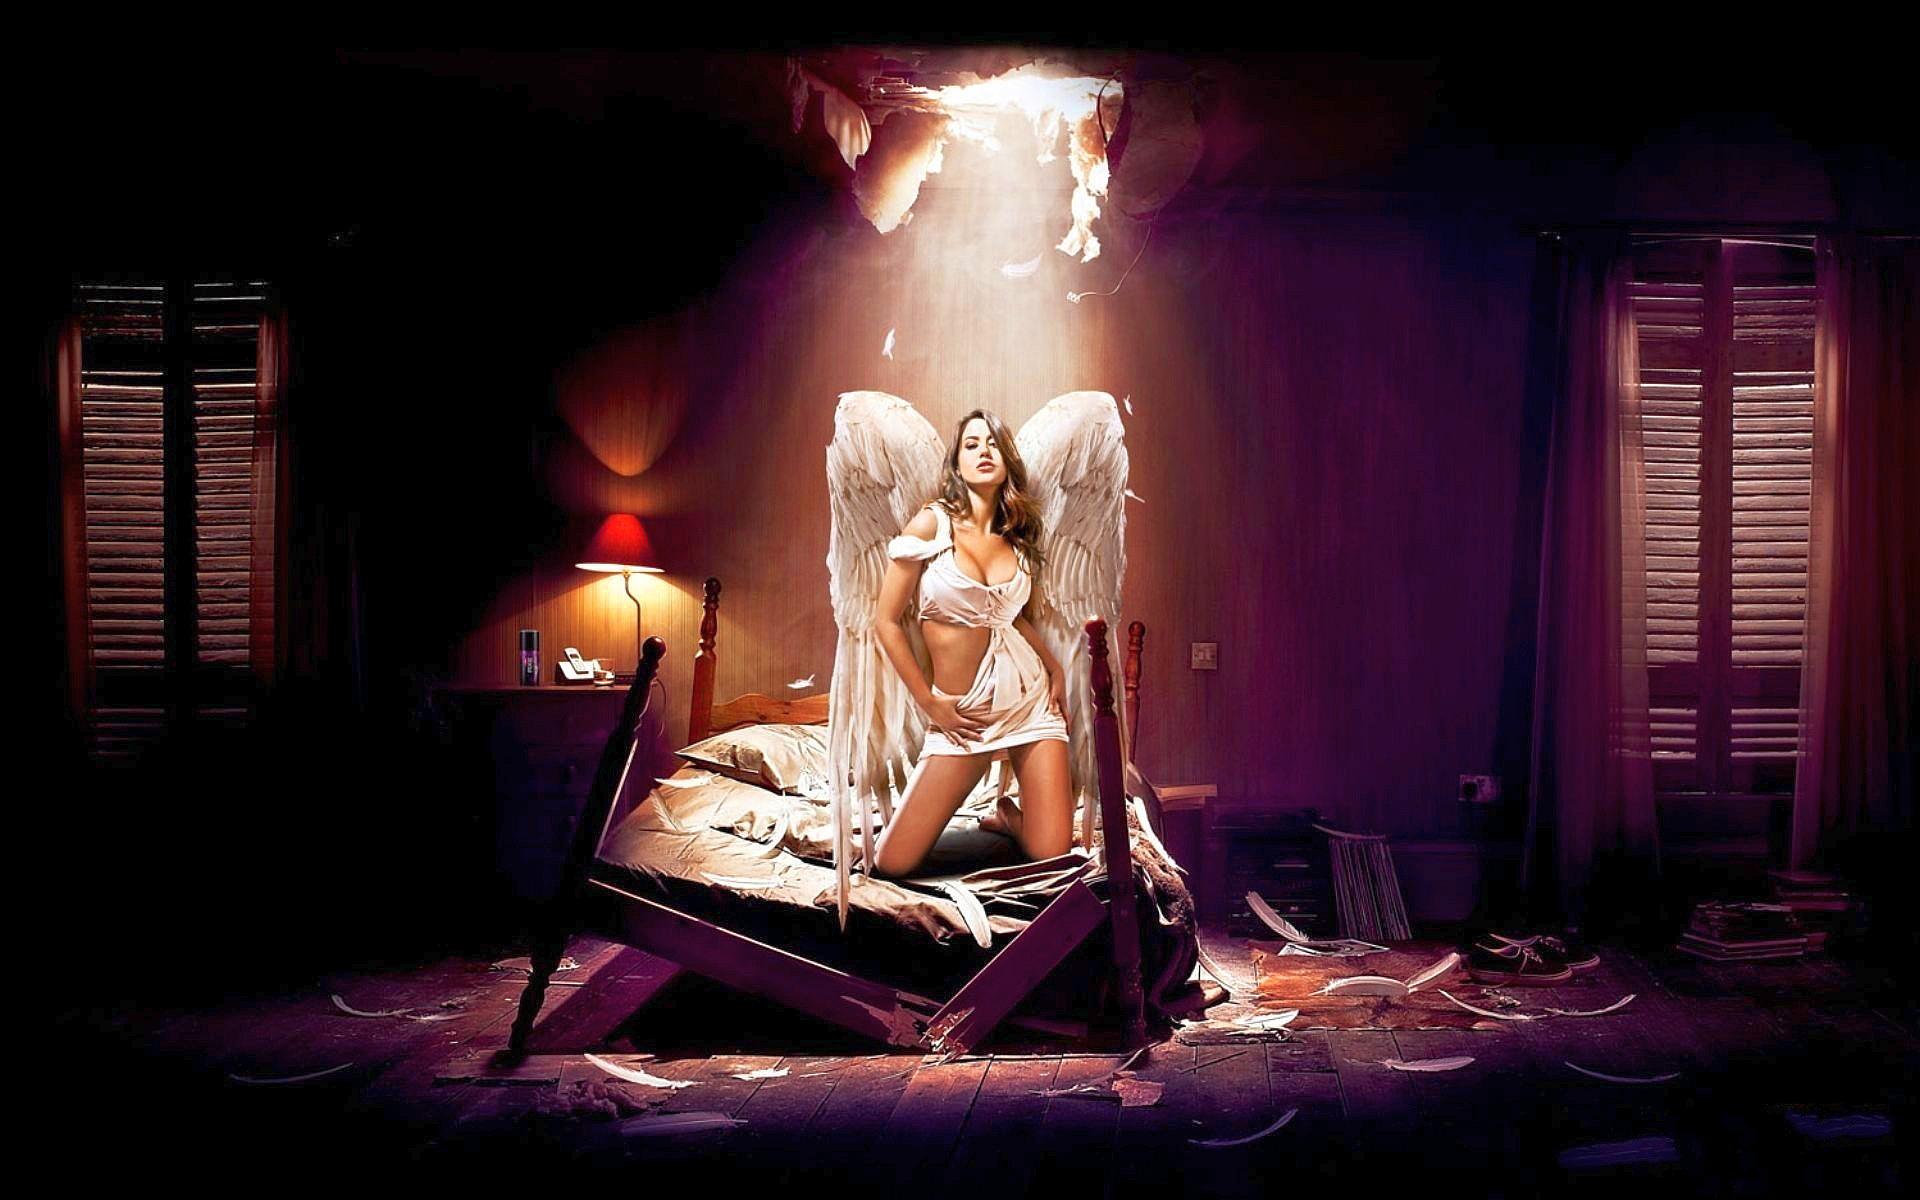 Fallen hot angel